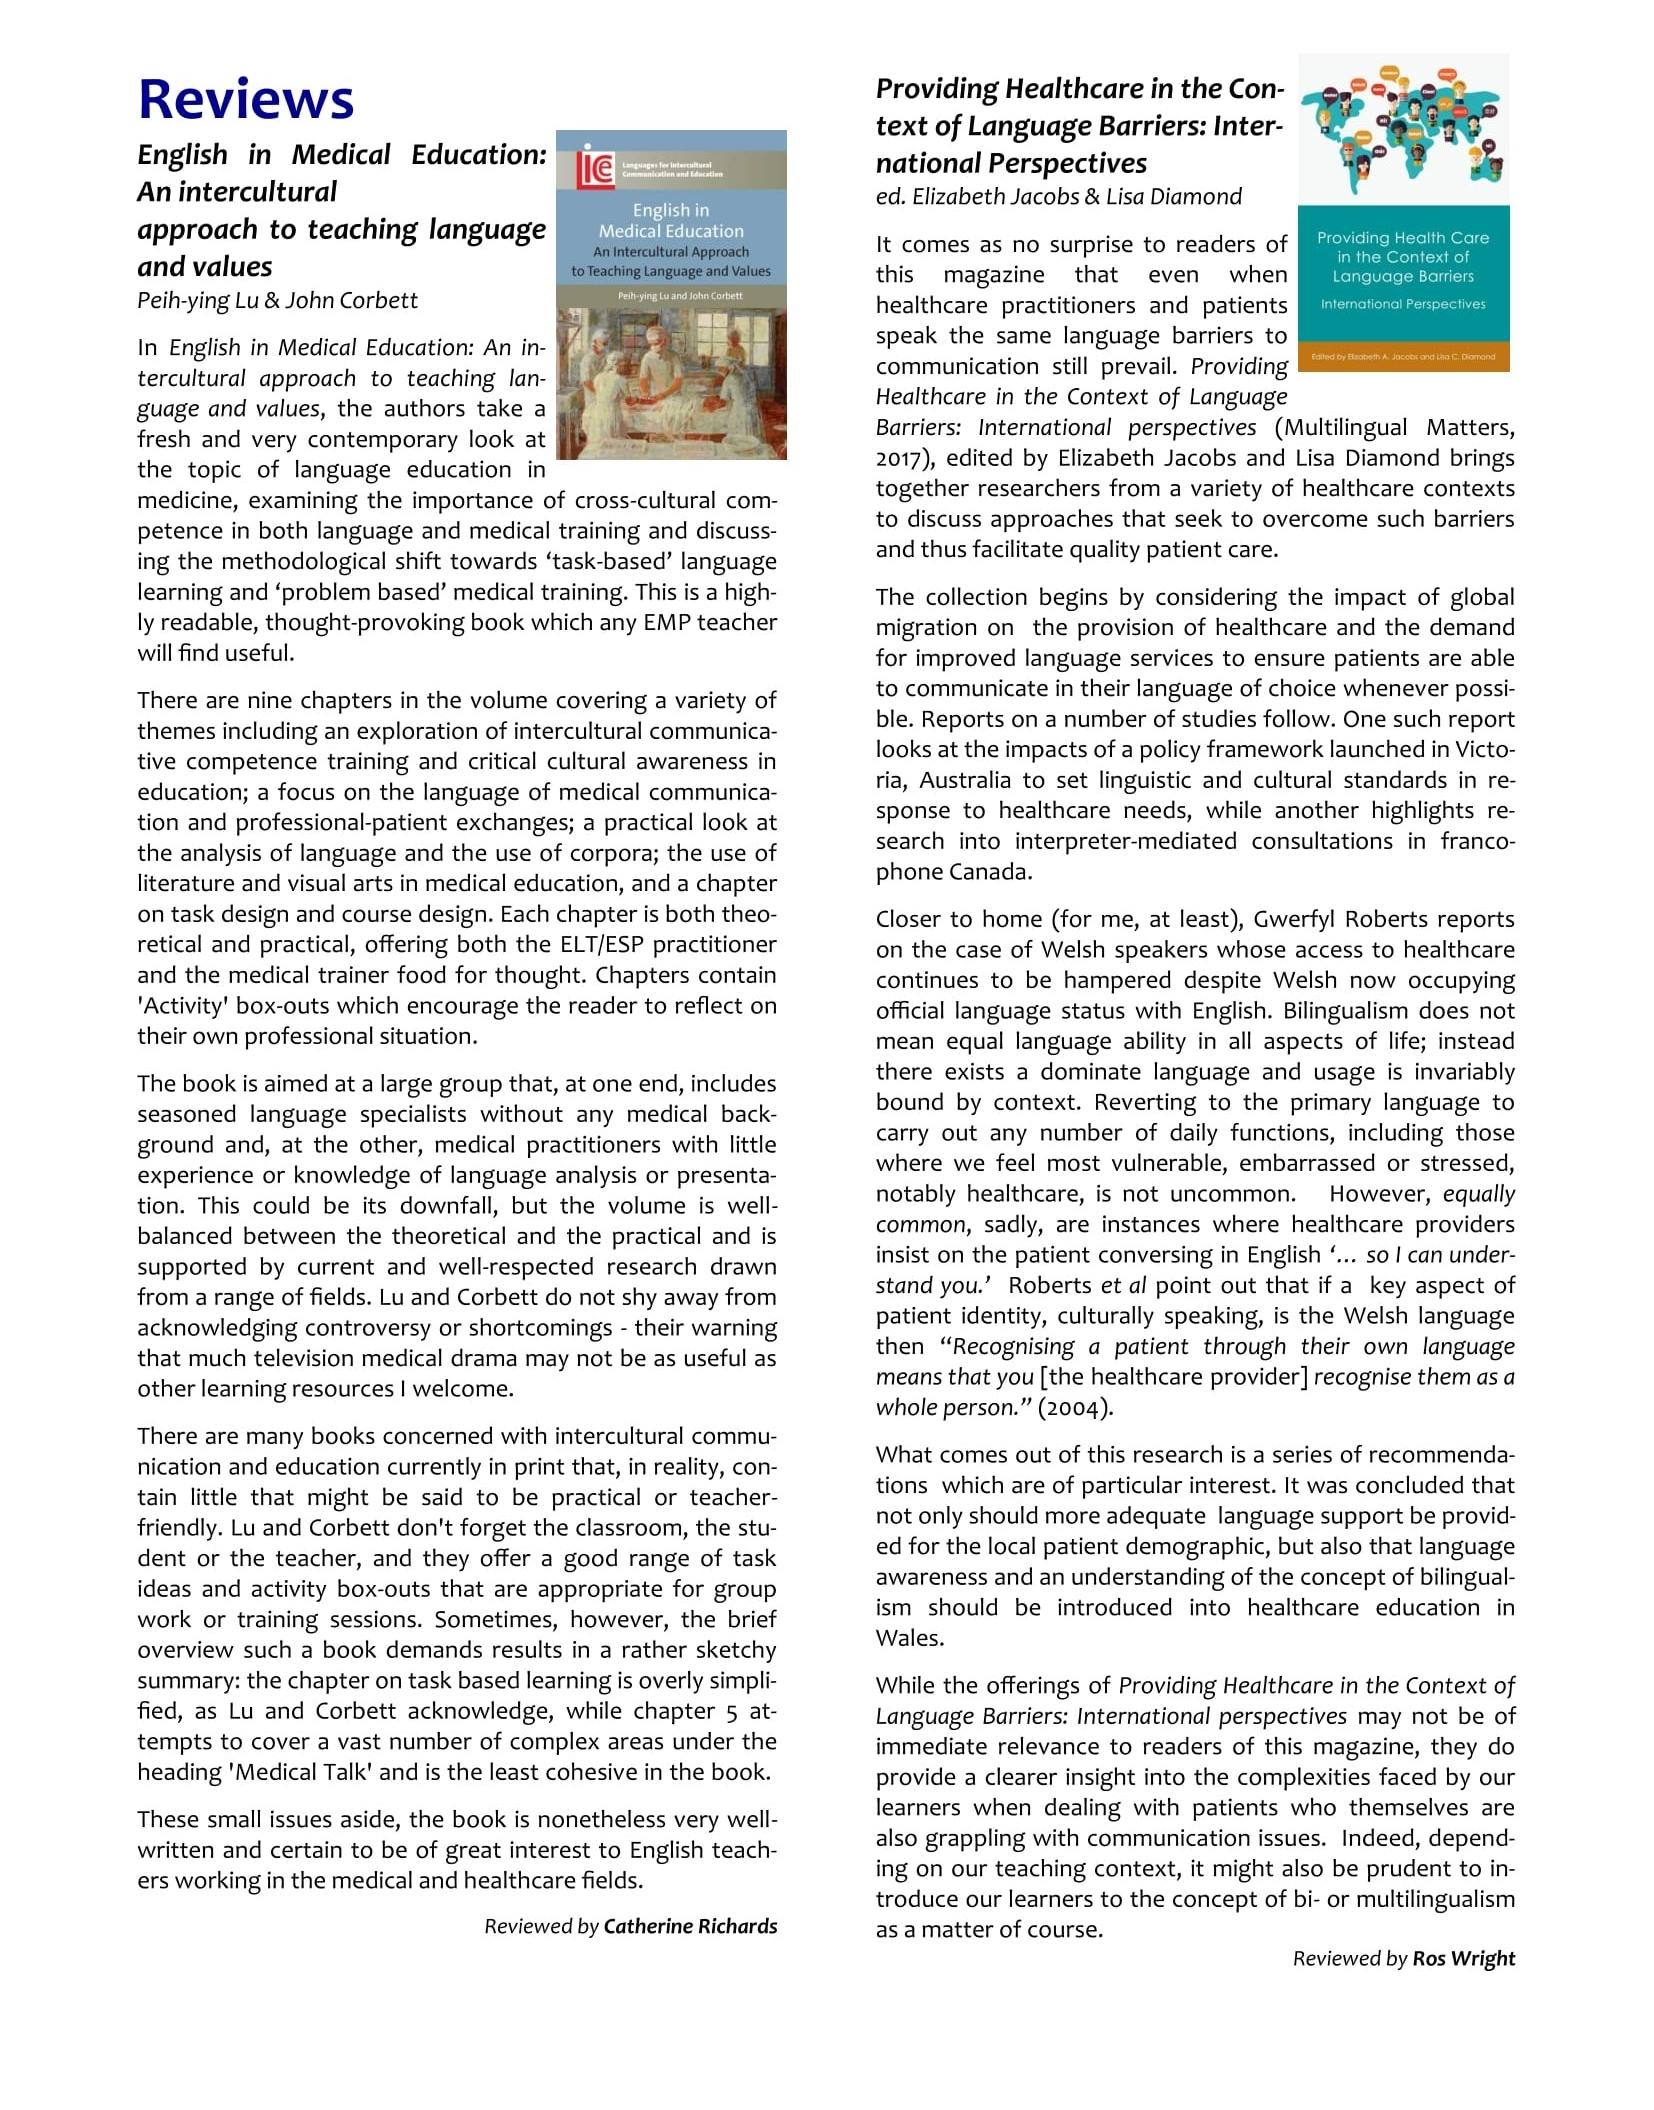 EALTHY Magazine Issue 5_print (4)-24.jpg